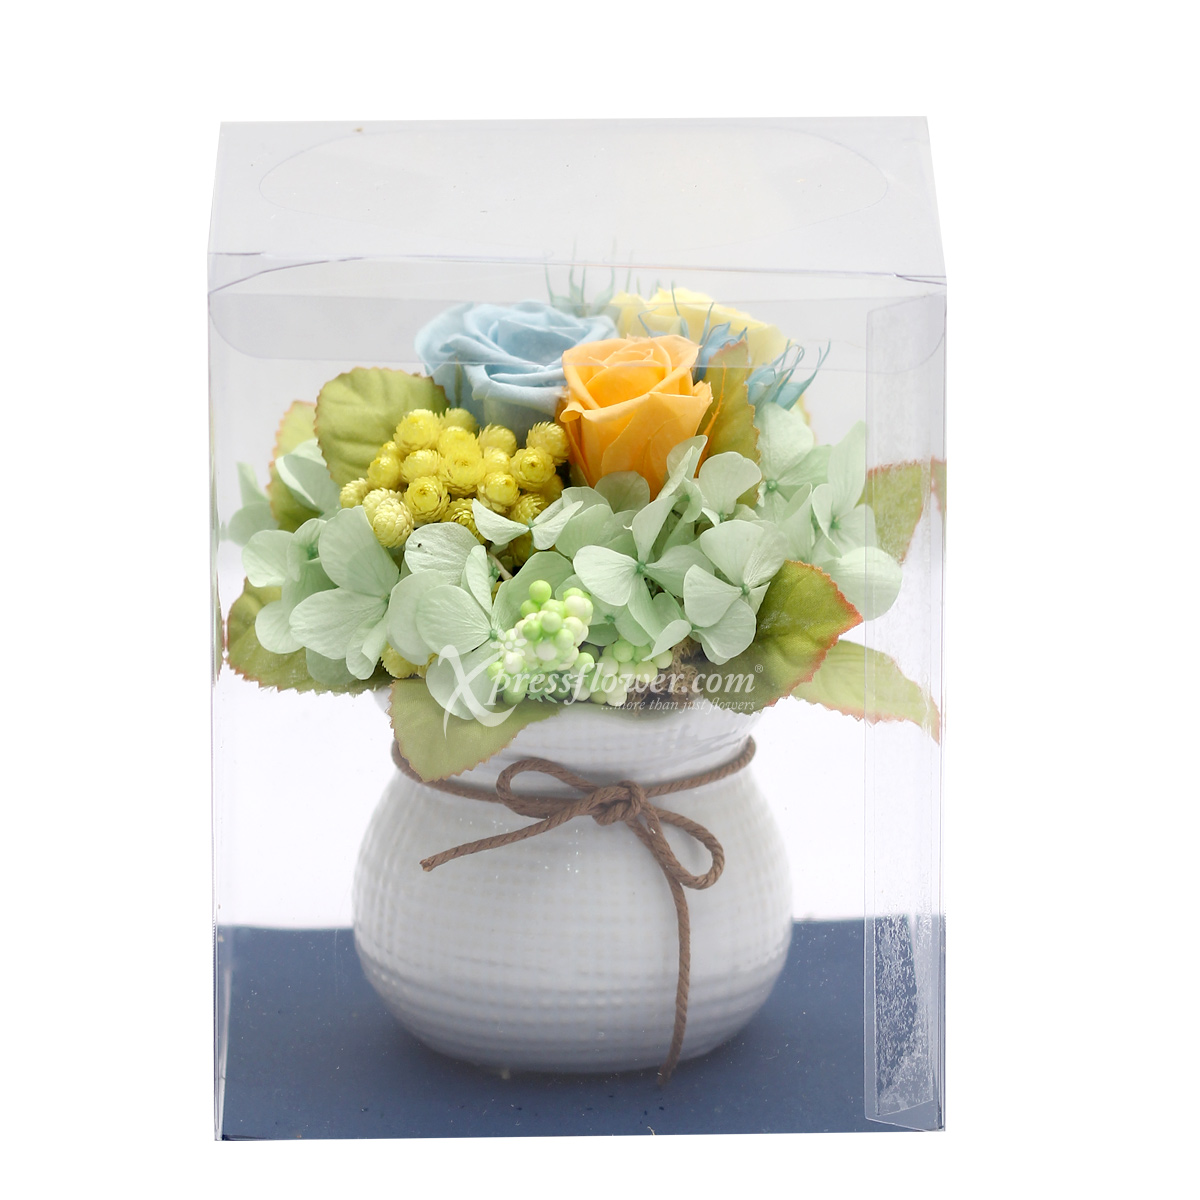 PR1915 Dainty Blossoms